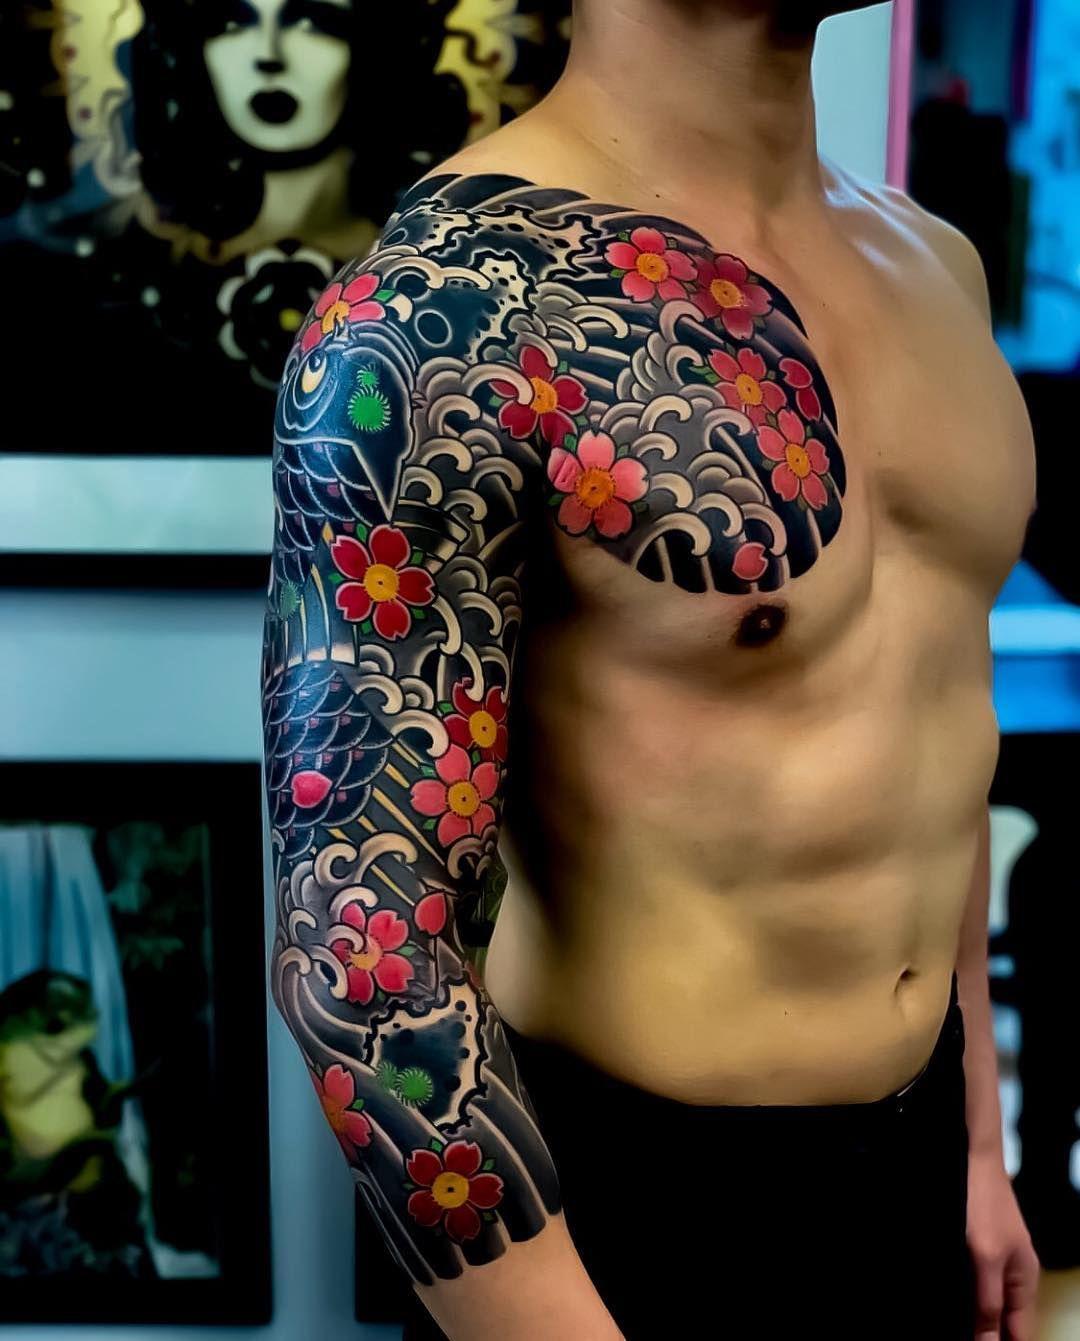 La Imagen Puede Contener Una Persona Primer Plano Japanese Sleeve Tattoos Koi Tattoo Sleeve Japanese Tattoo